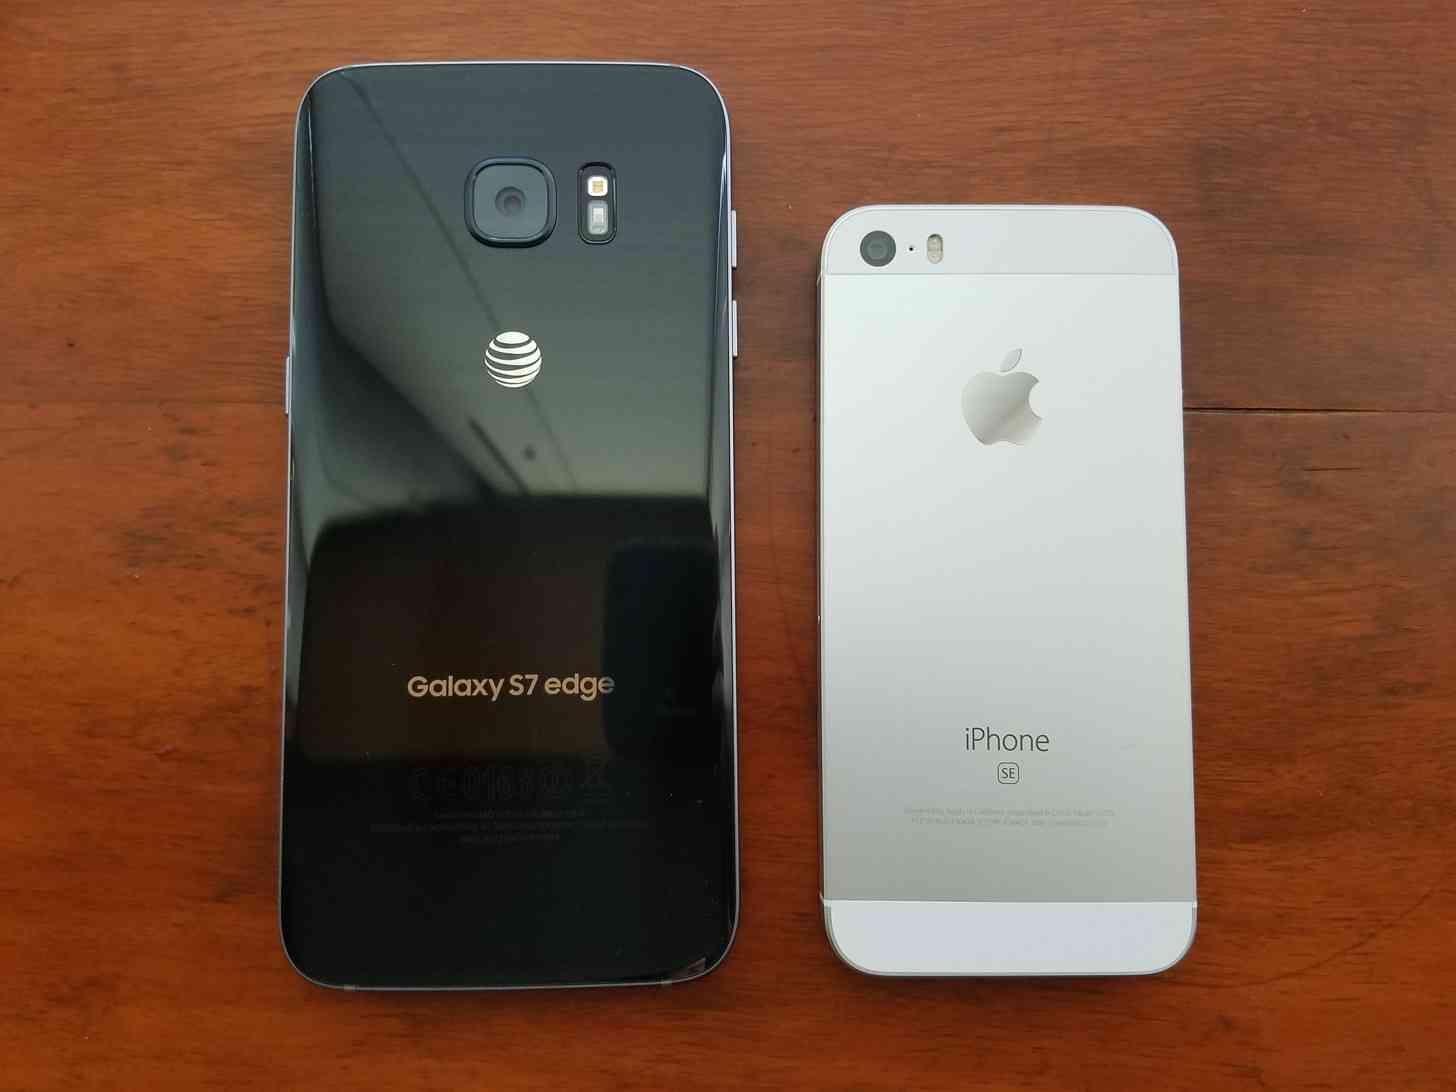 Samsung Galaxy S7 Edge and Apple iPhone SE